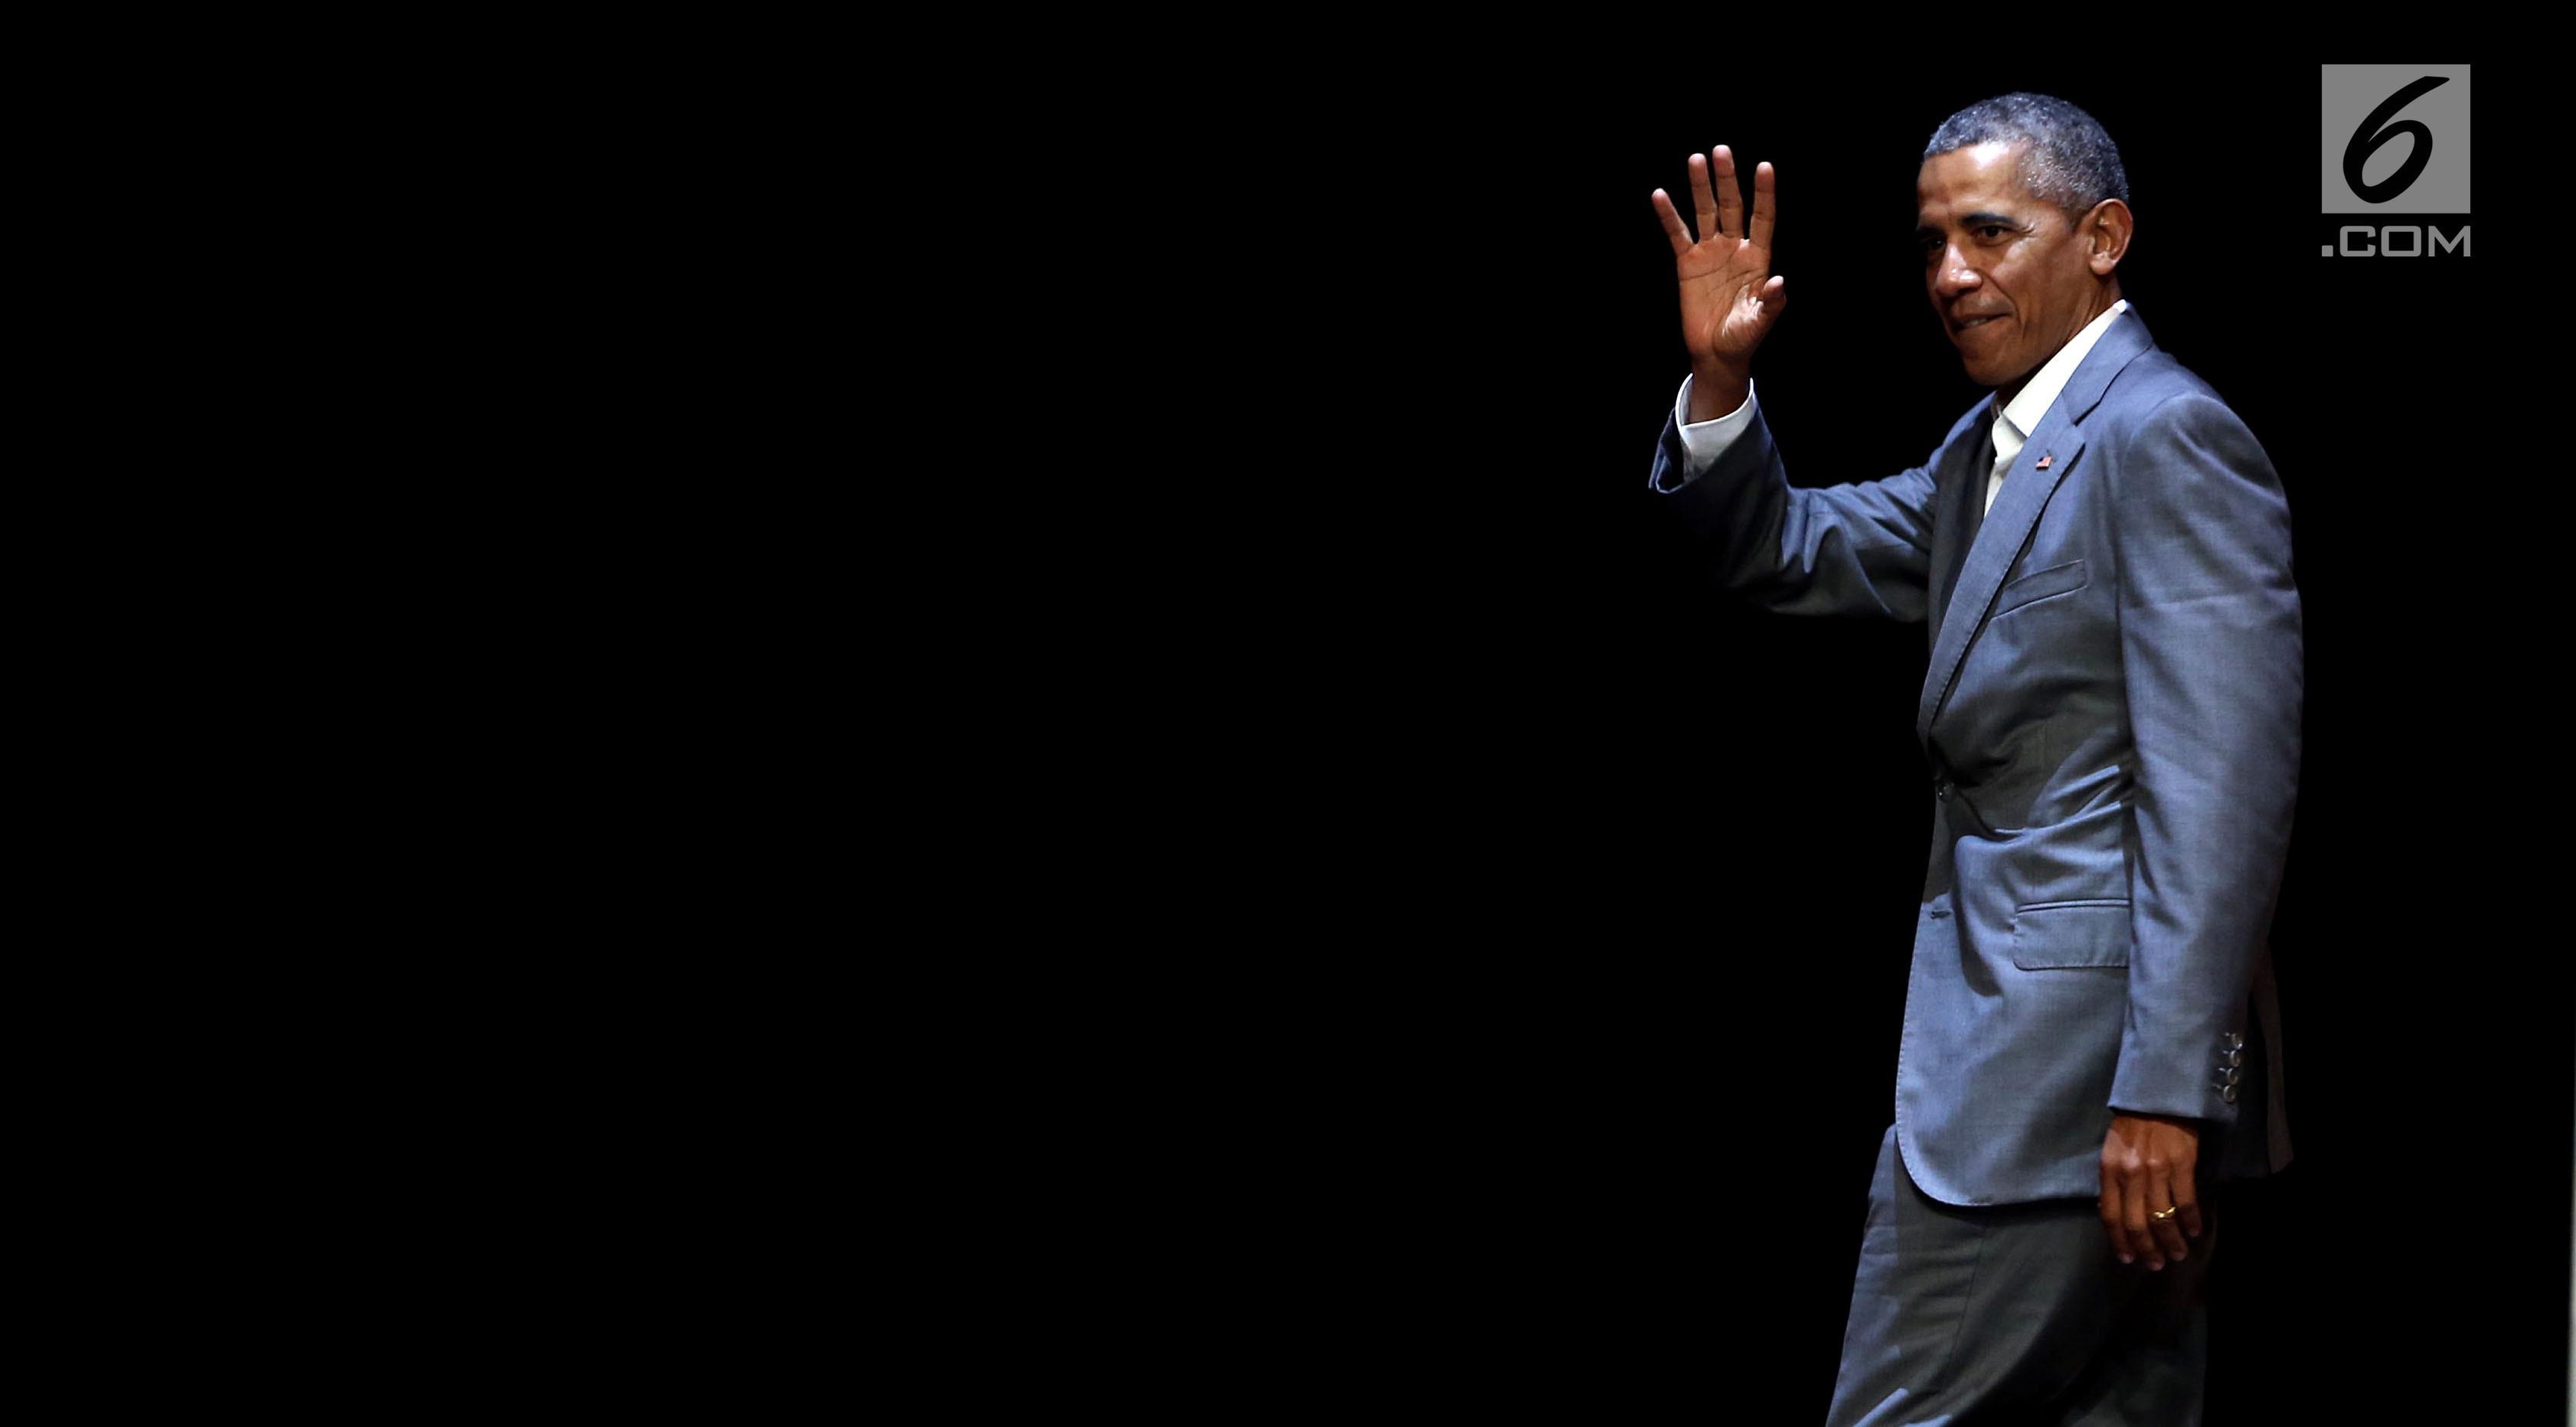 Presiden AS ke-44, Barack Obama menyapa hadirin saat 4th Congress of Indonesian Diaspora di Kota Kasablanka, Jakarta, Sabtu (1/7). Dalam pidatonya, Obama menceritakan pengalamannya berwisata ke Bali dan Yogyakarta. (Liputan6.com/Johan Tallo)